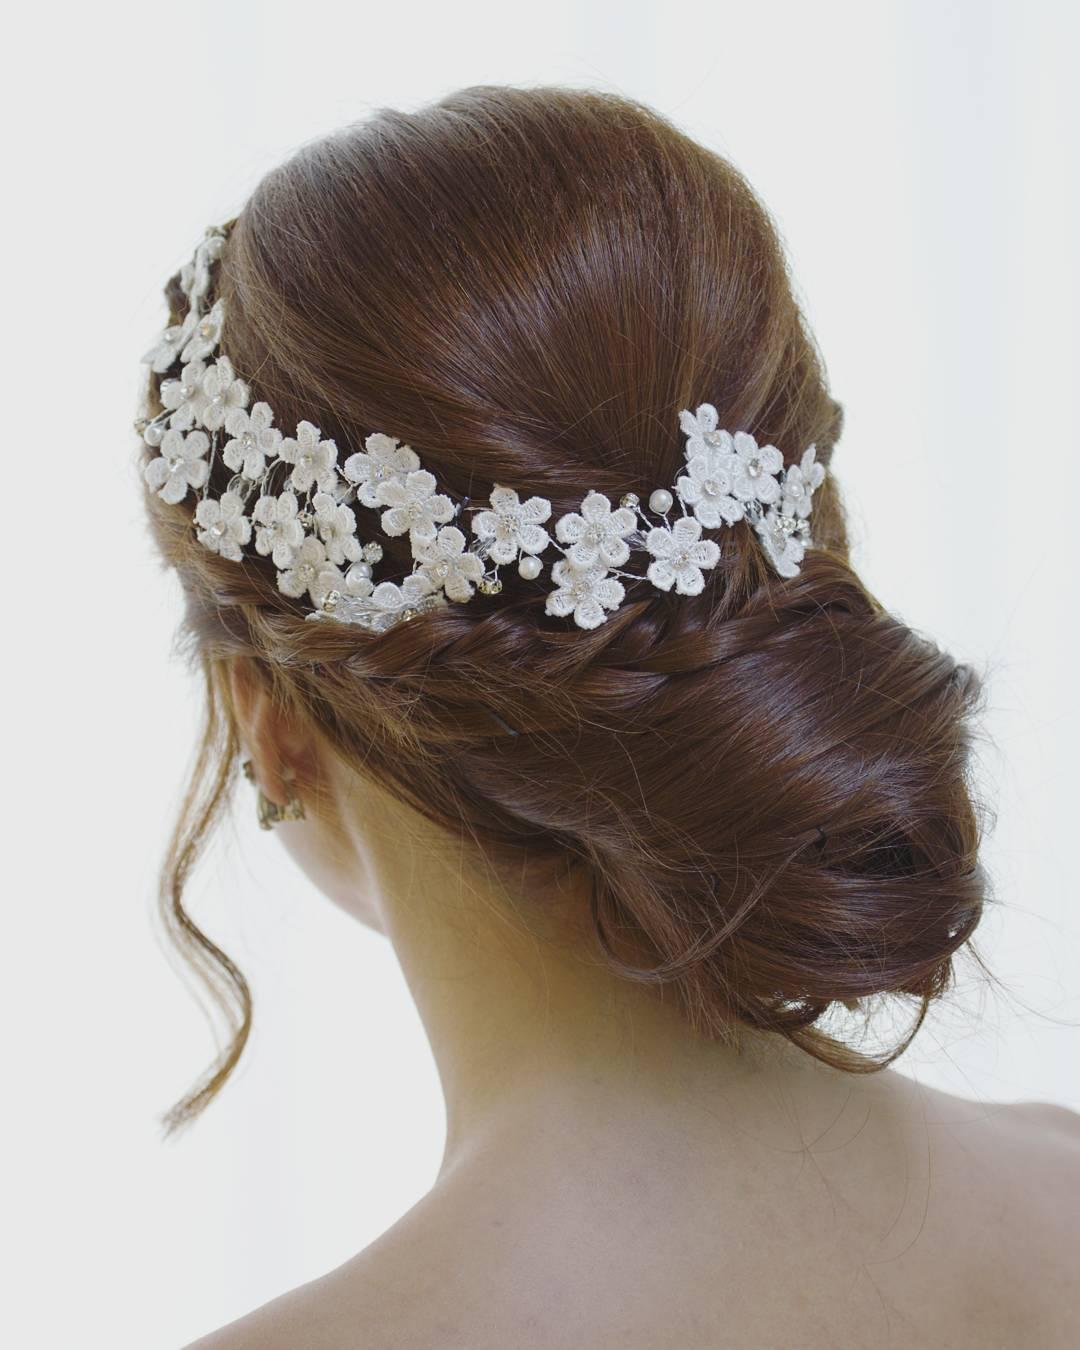 charlane_yu-side-braided-hairstyle-wedding-long-hair